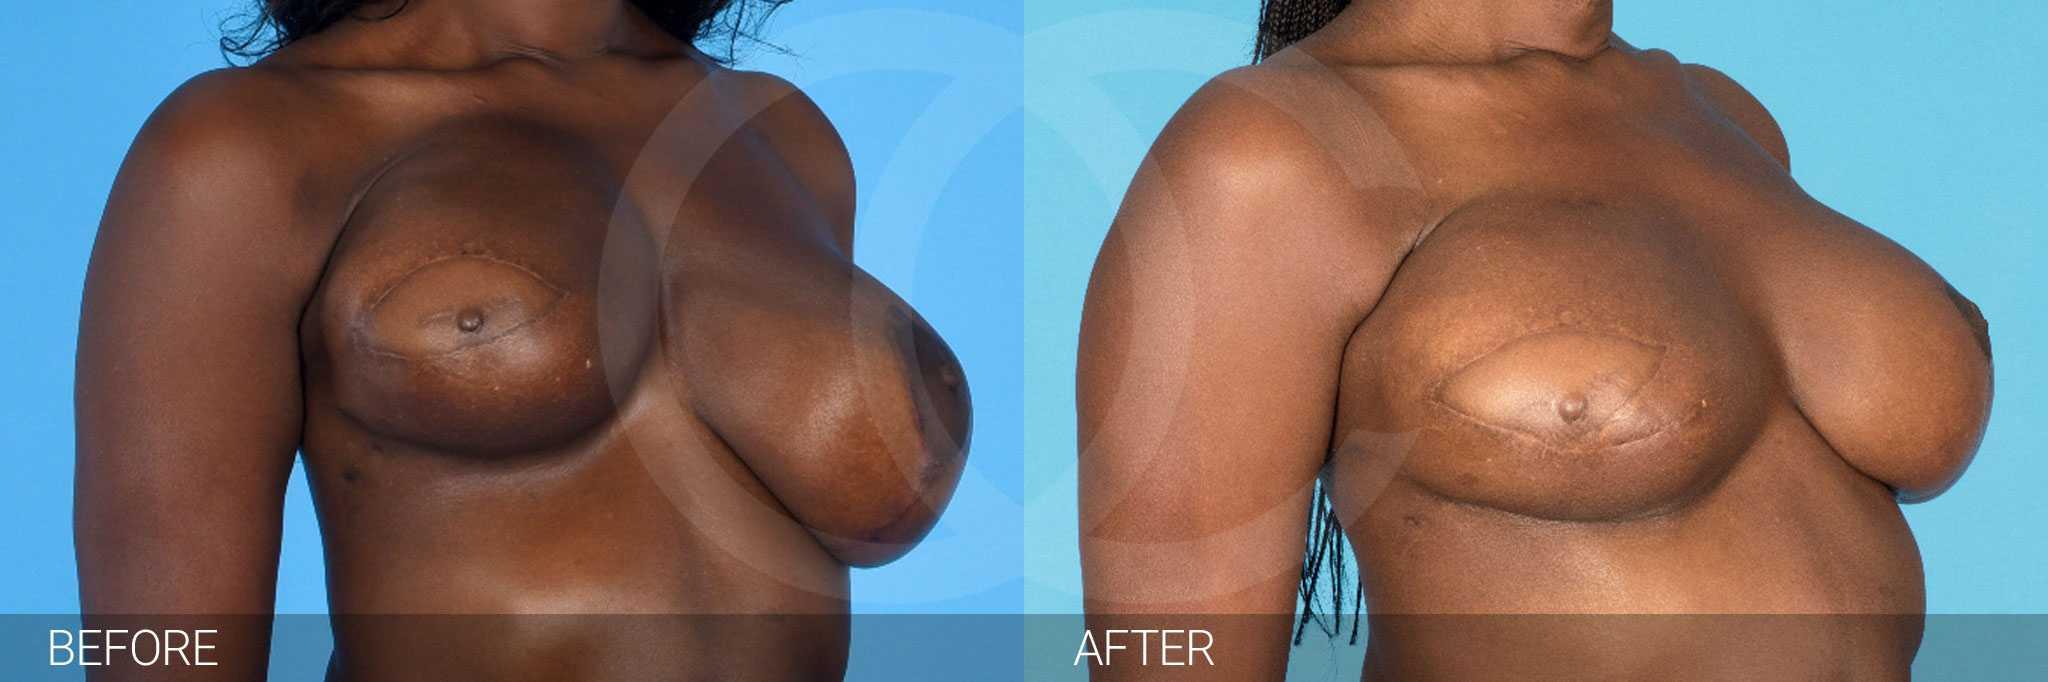 Breast Reconstruction Reconstructive Breast Surgery ante/post-op II